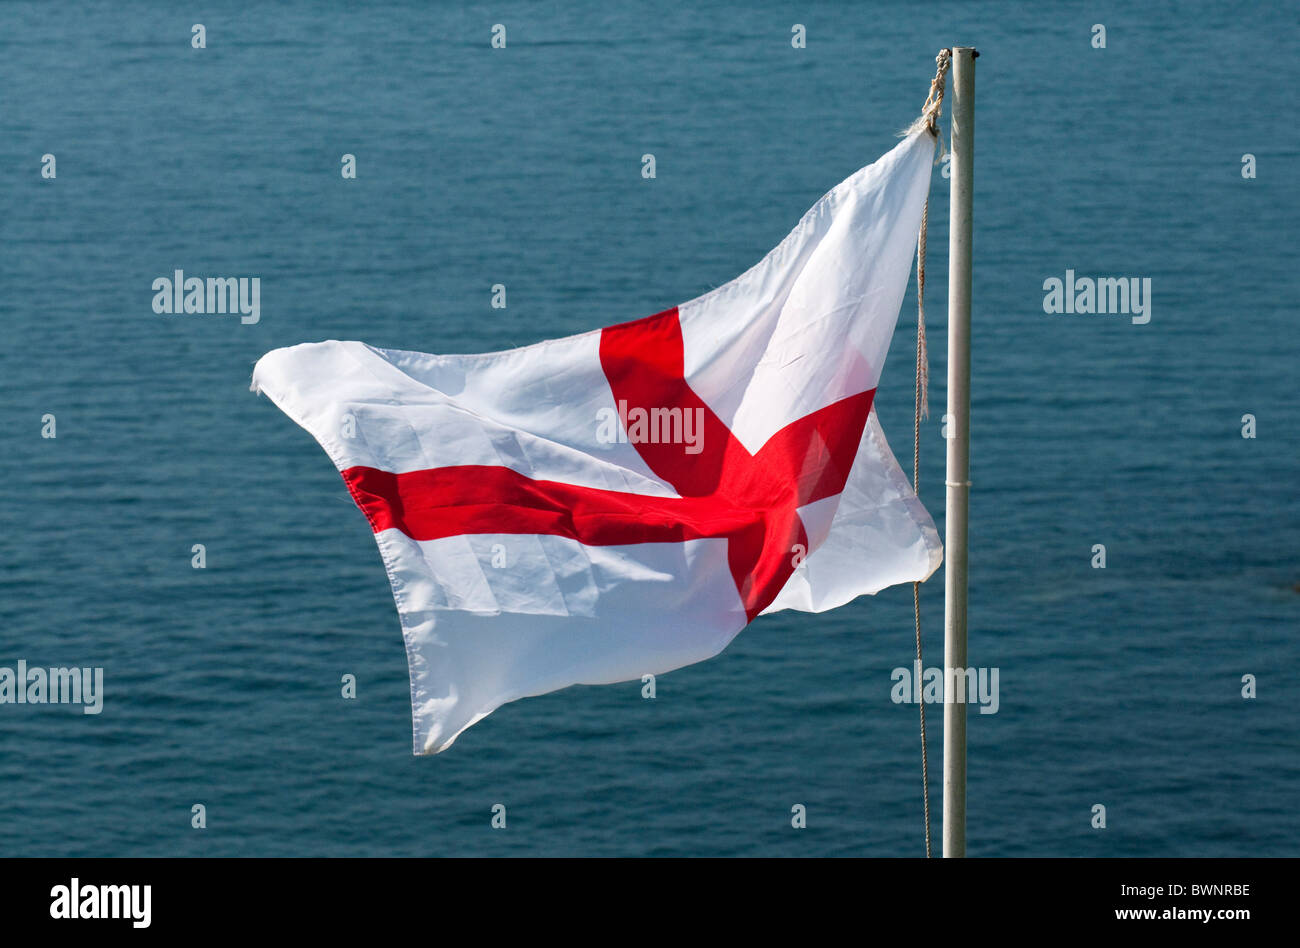 Cross of Saint George flag, national flag of England, with sea beyond - Stock Image